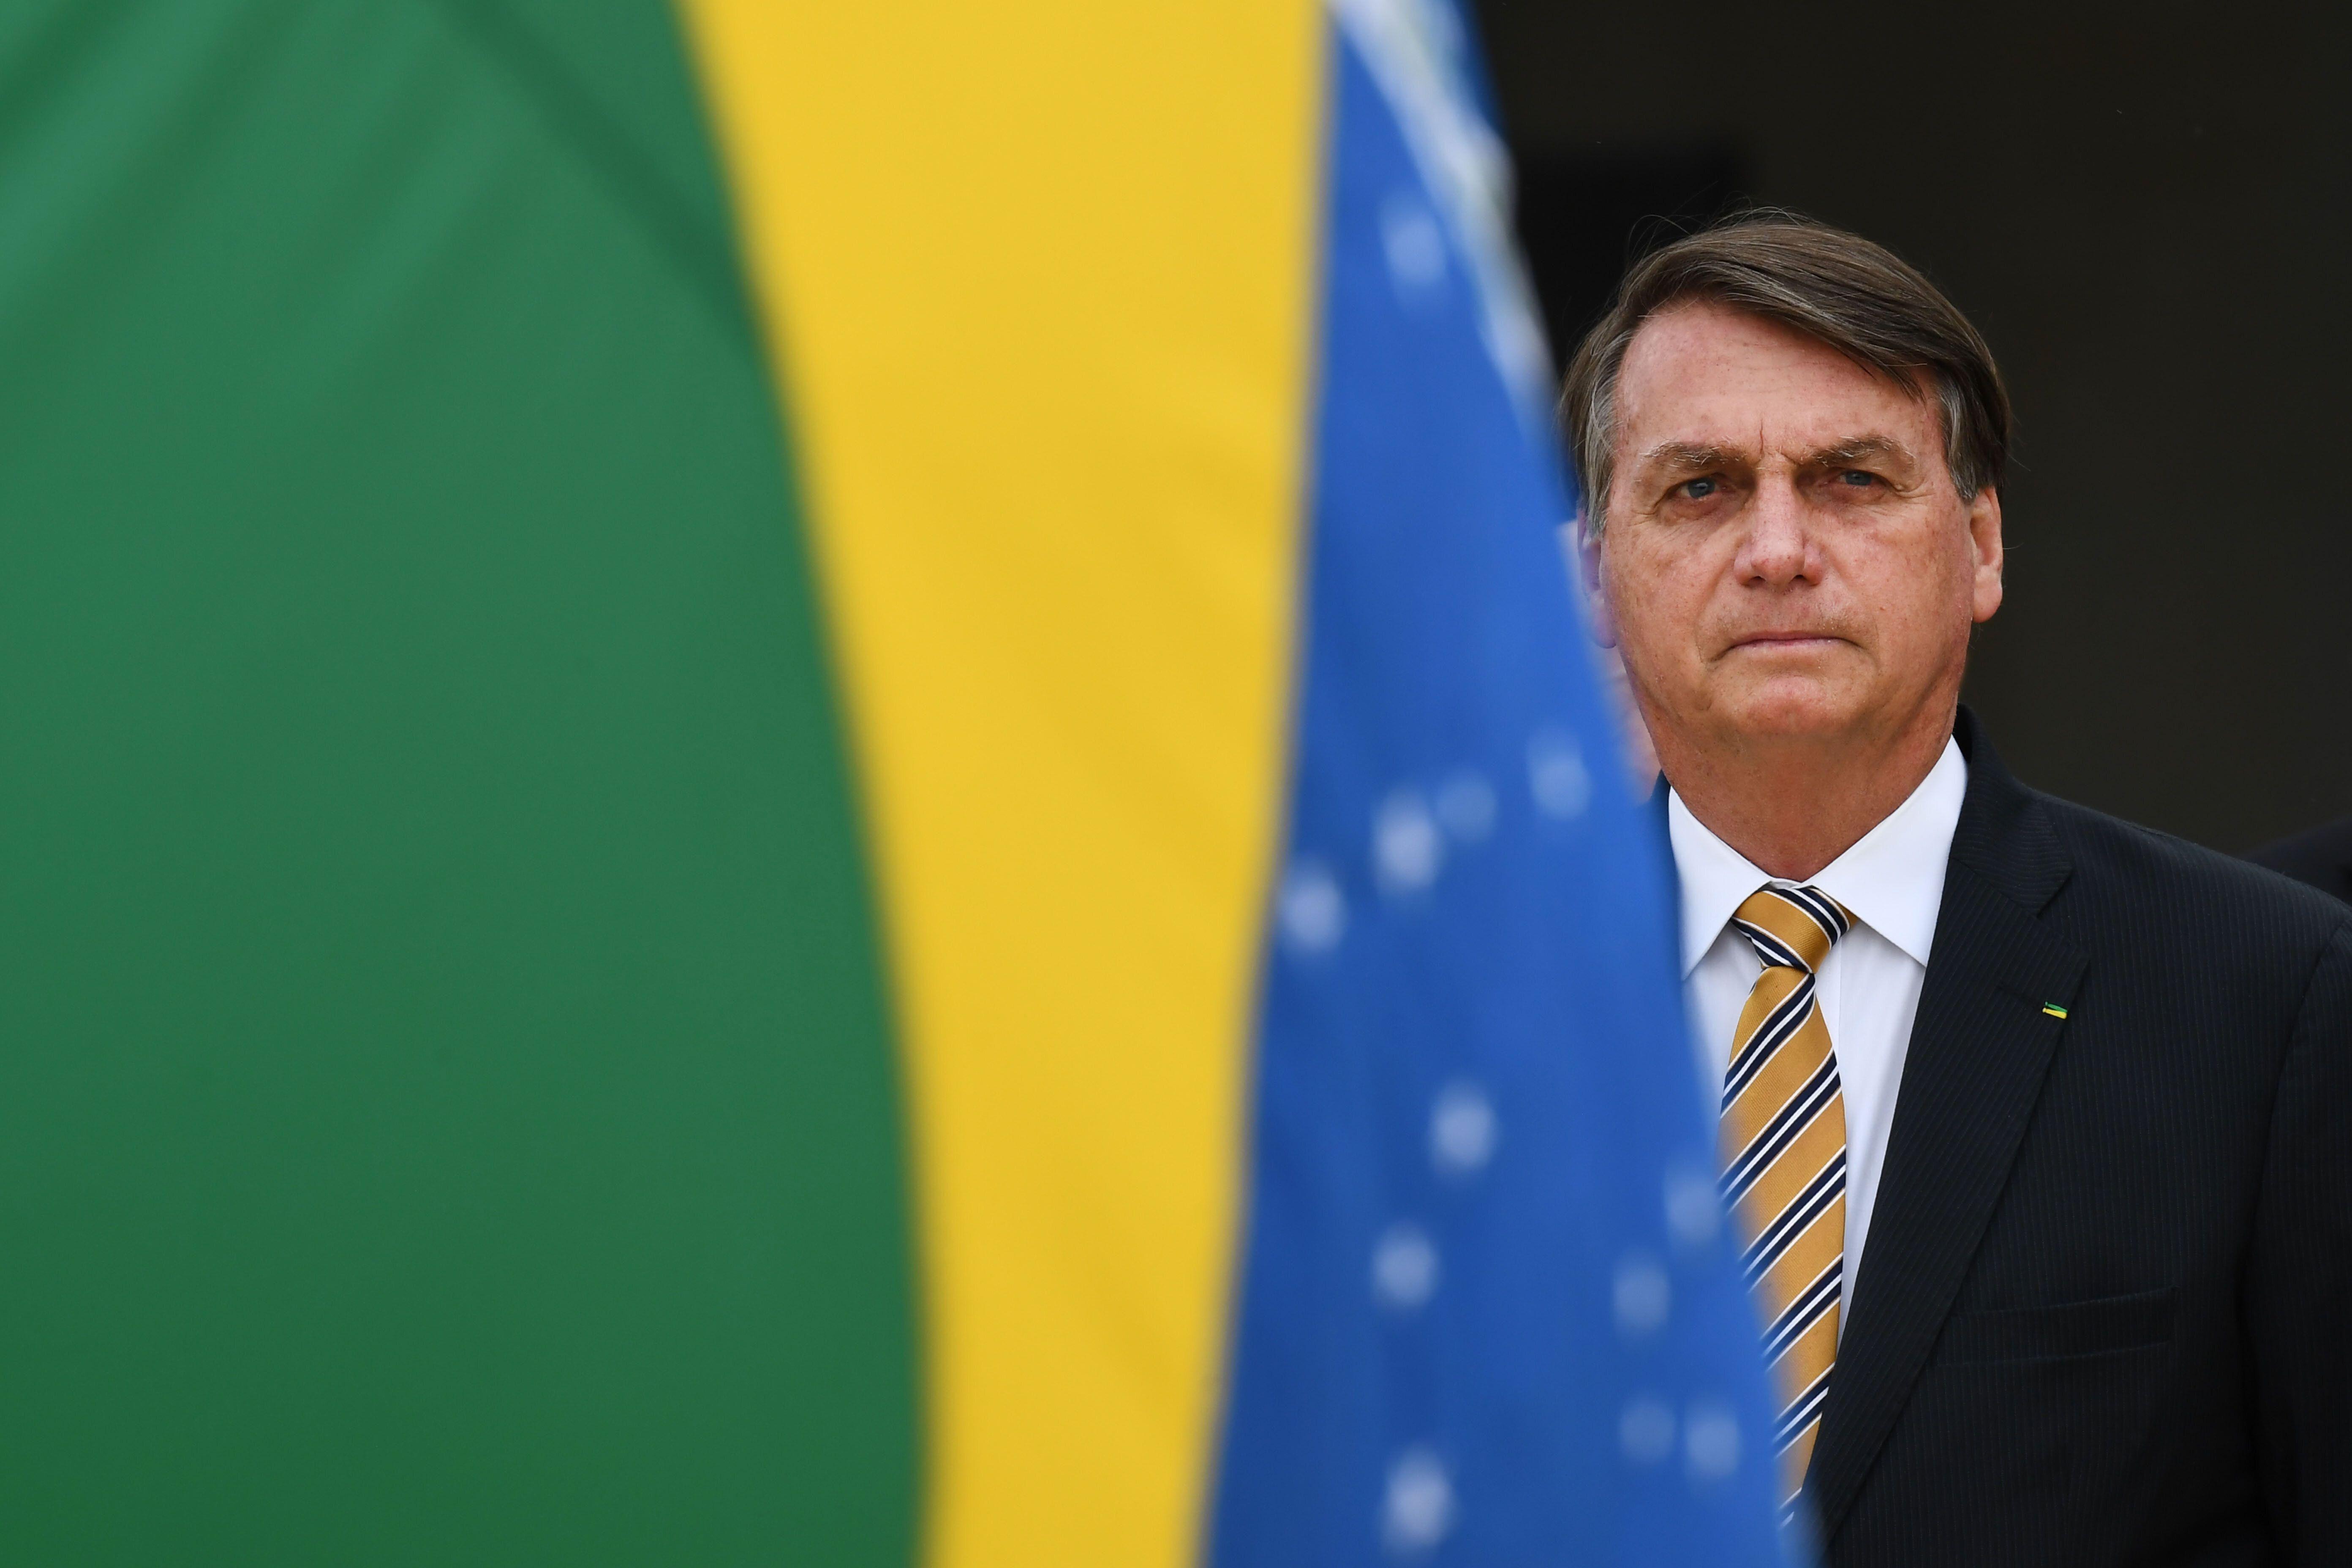 Brazilian President Jair Bolsonaro found refuge from international scorn in former President Donald Trump's climate denial. U